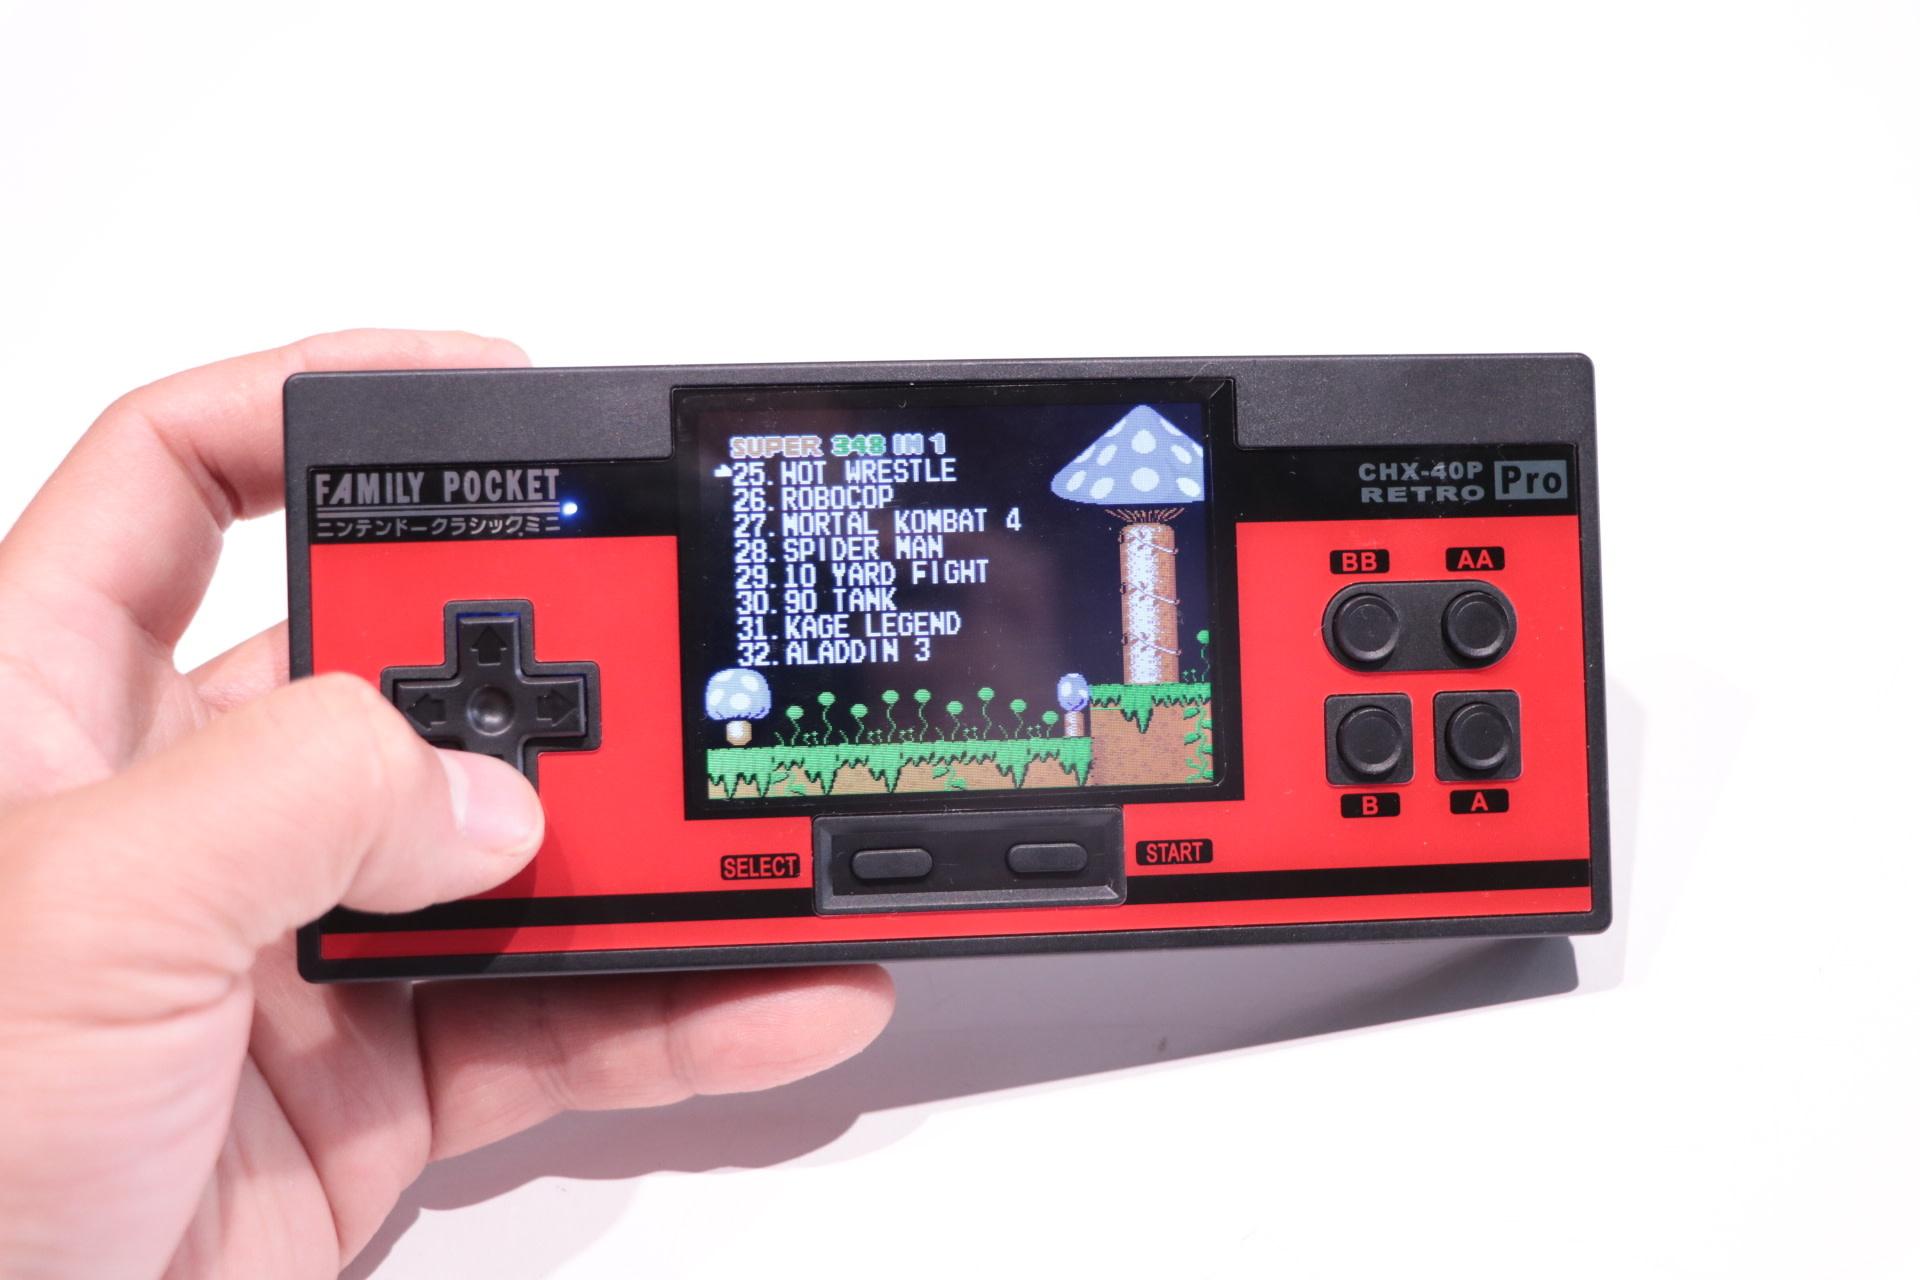 CHX-40P Retro PRO Game 348